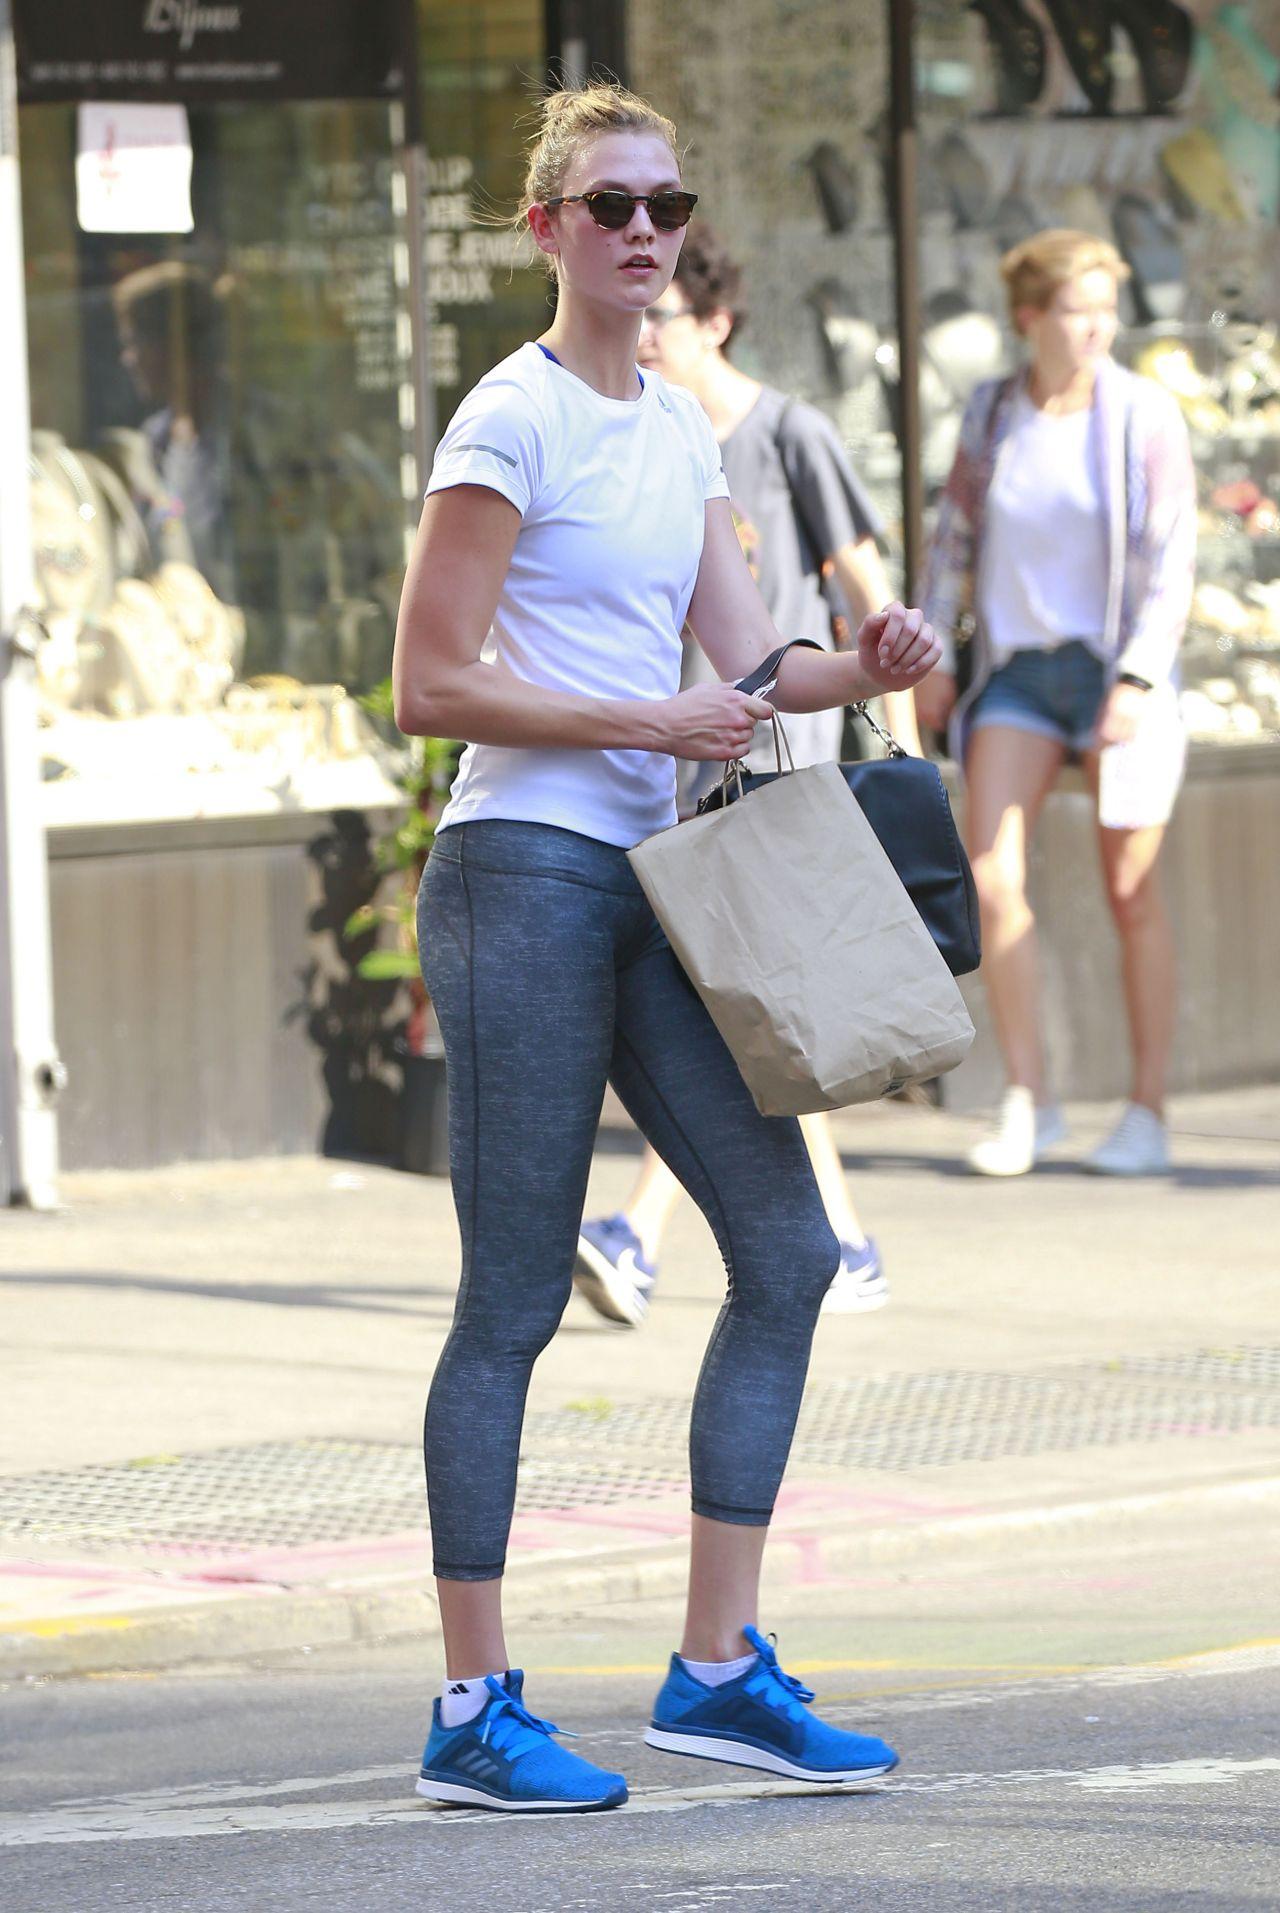 Karlie Kloss - After a Workout Session ...